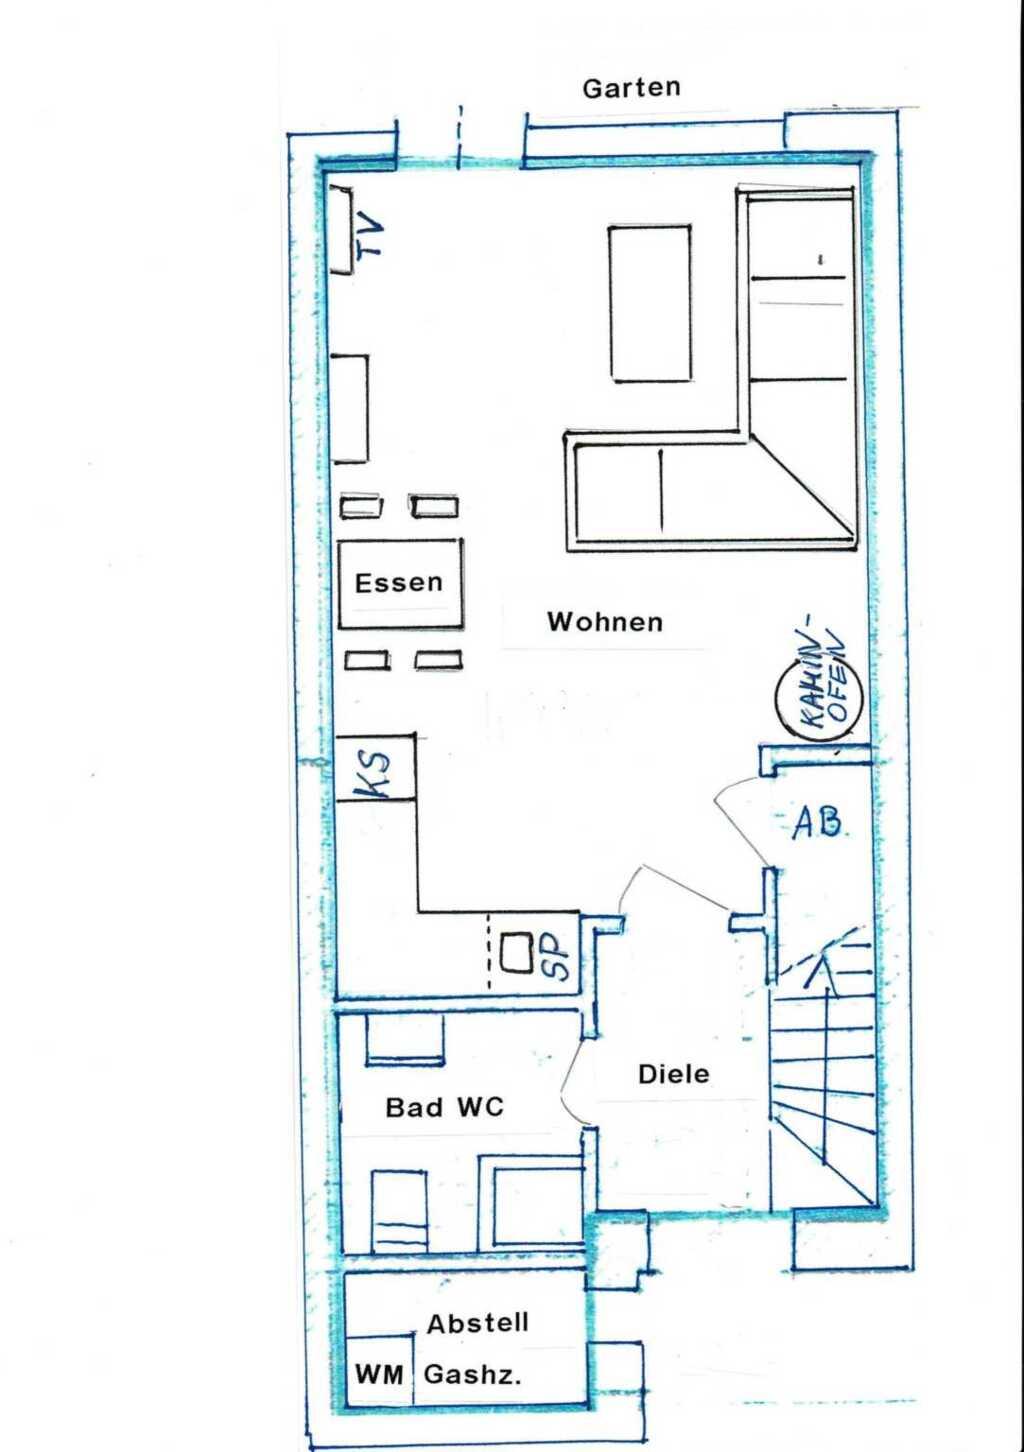 Ferienhaus Haus Blauort - Sabine Mohr, Ferienhaus